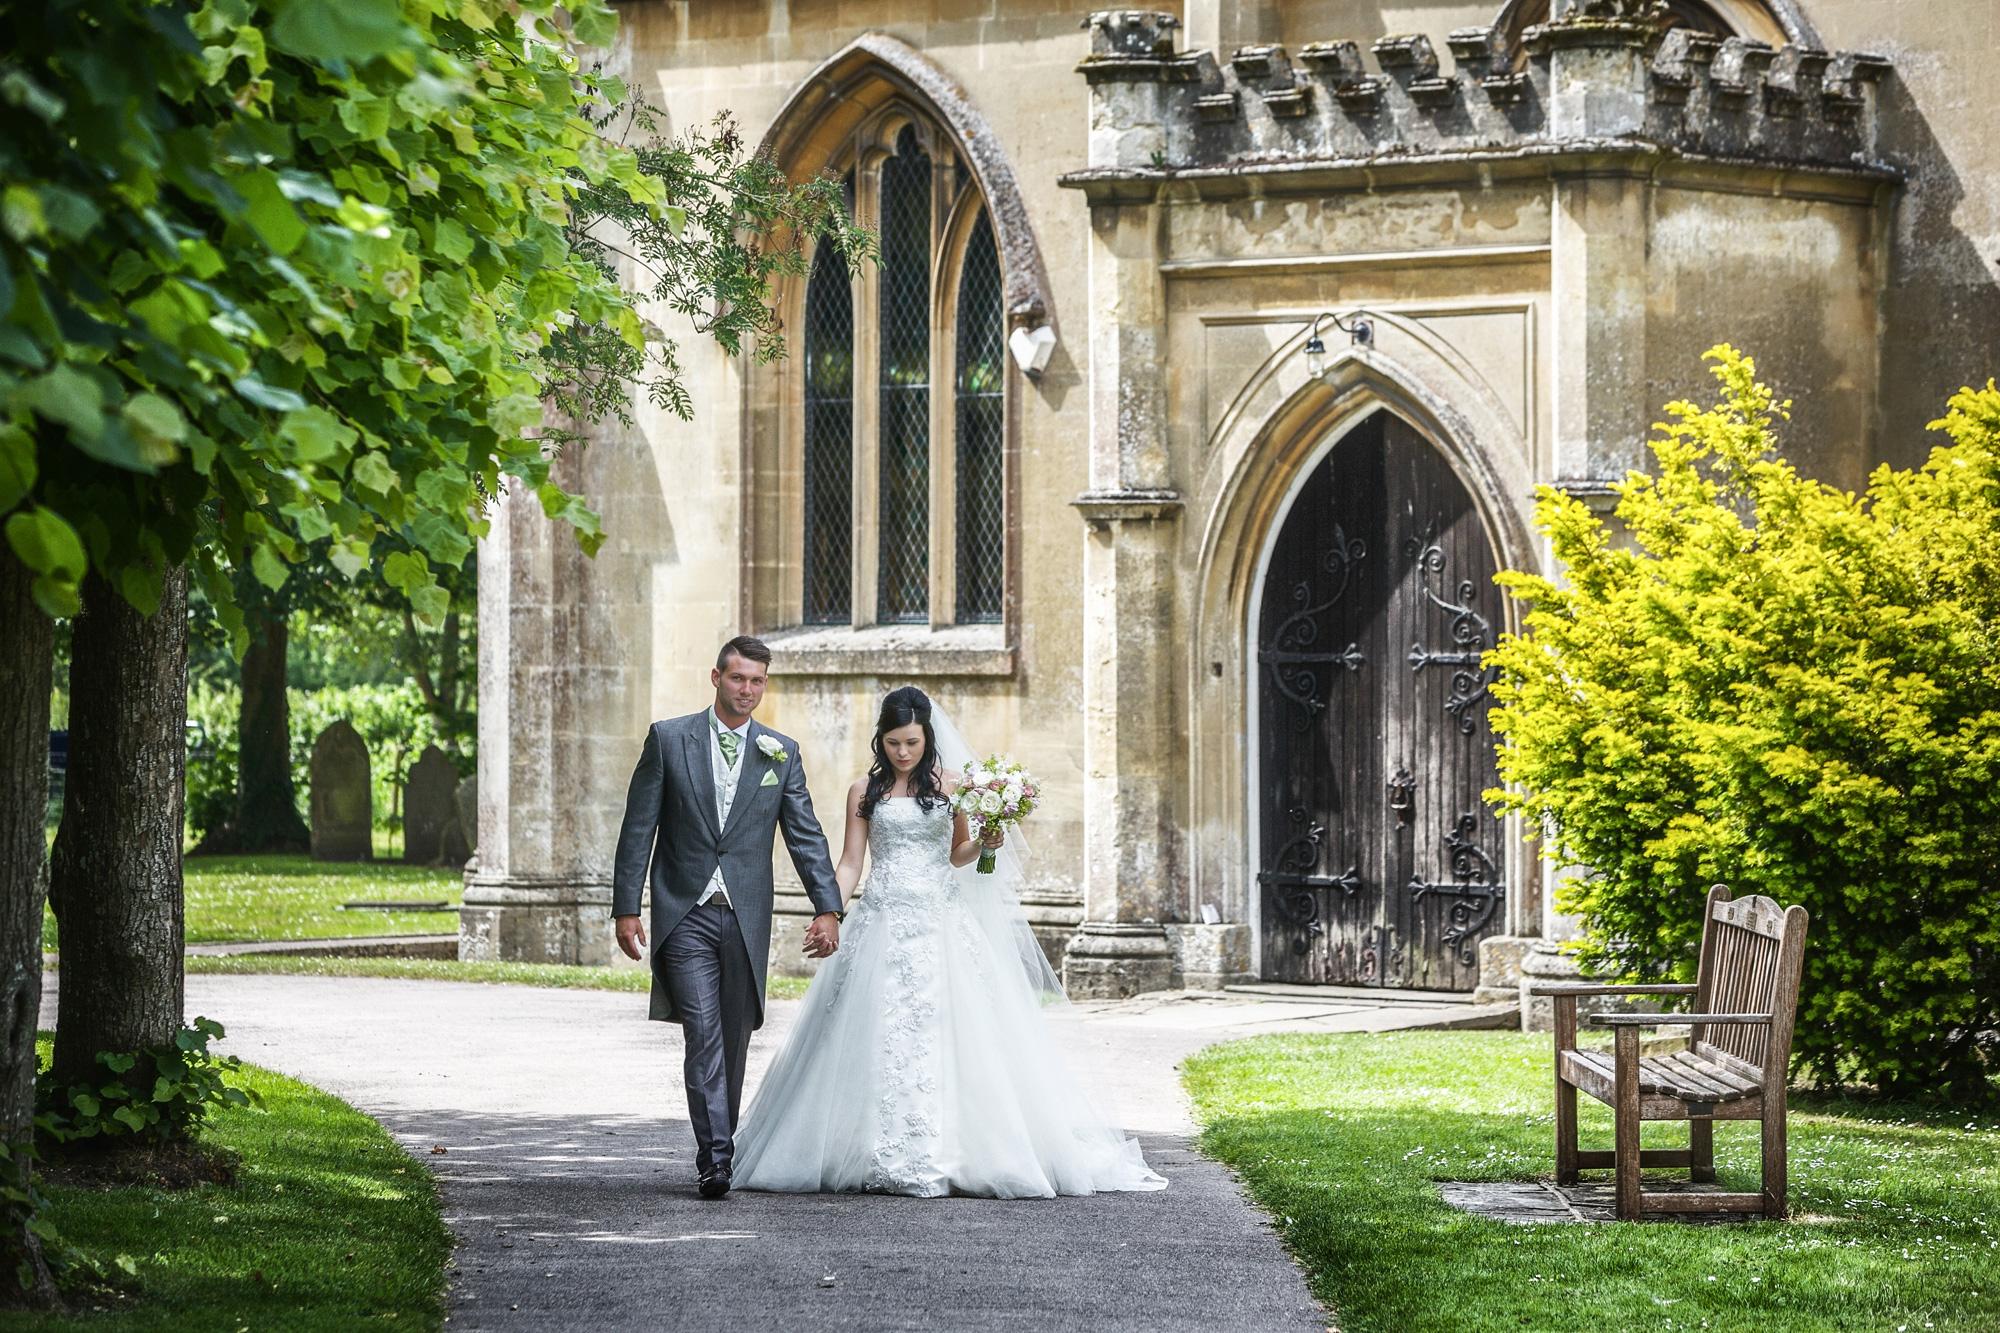 Adam_Hillier_Wedding_Photographer_Newbury_Berkshire_6 (4).jpg